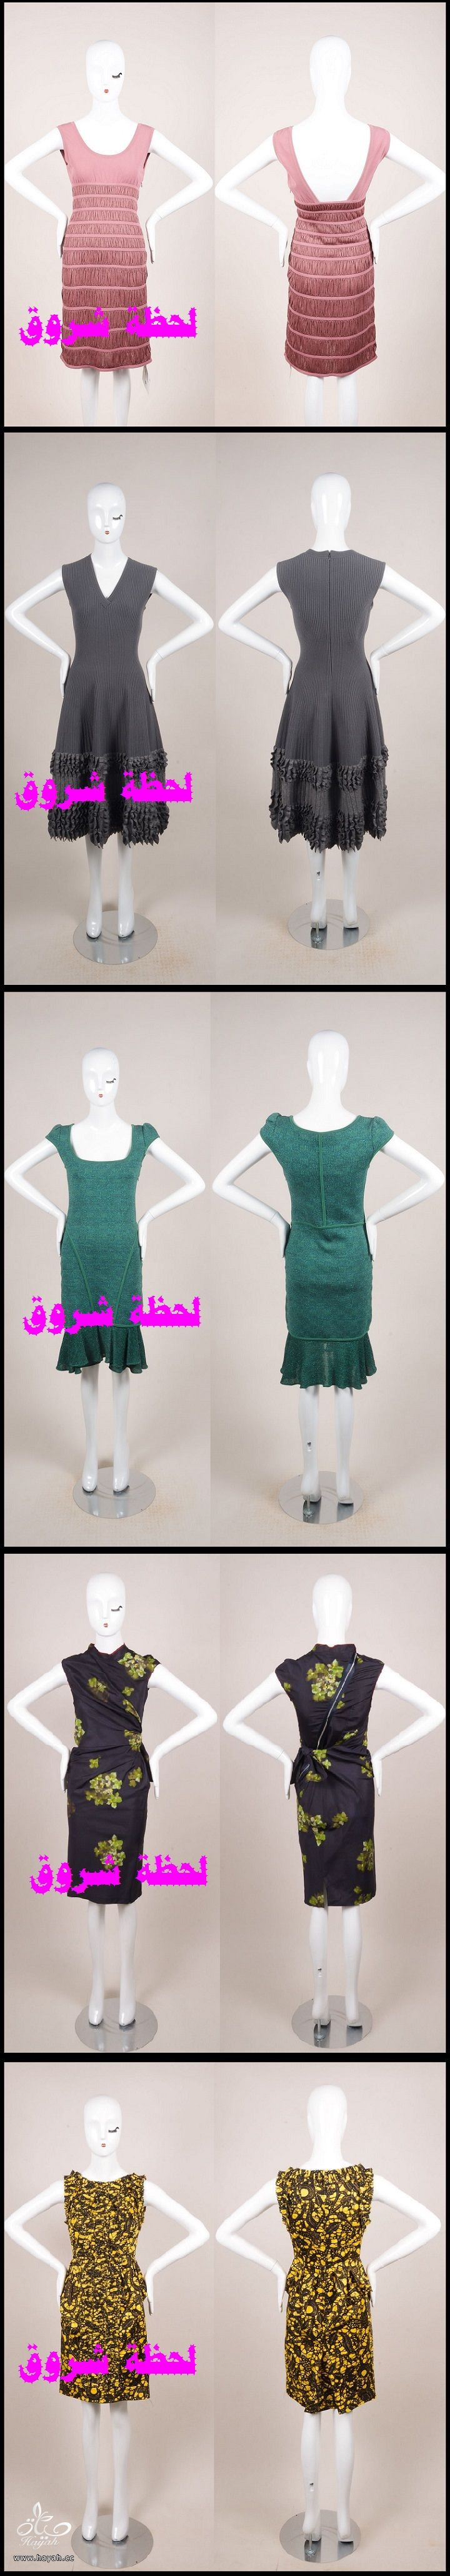 Dresses2015 hayahcc_1434750997_987.jpg